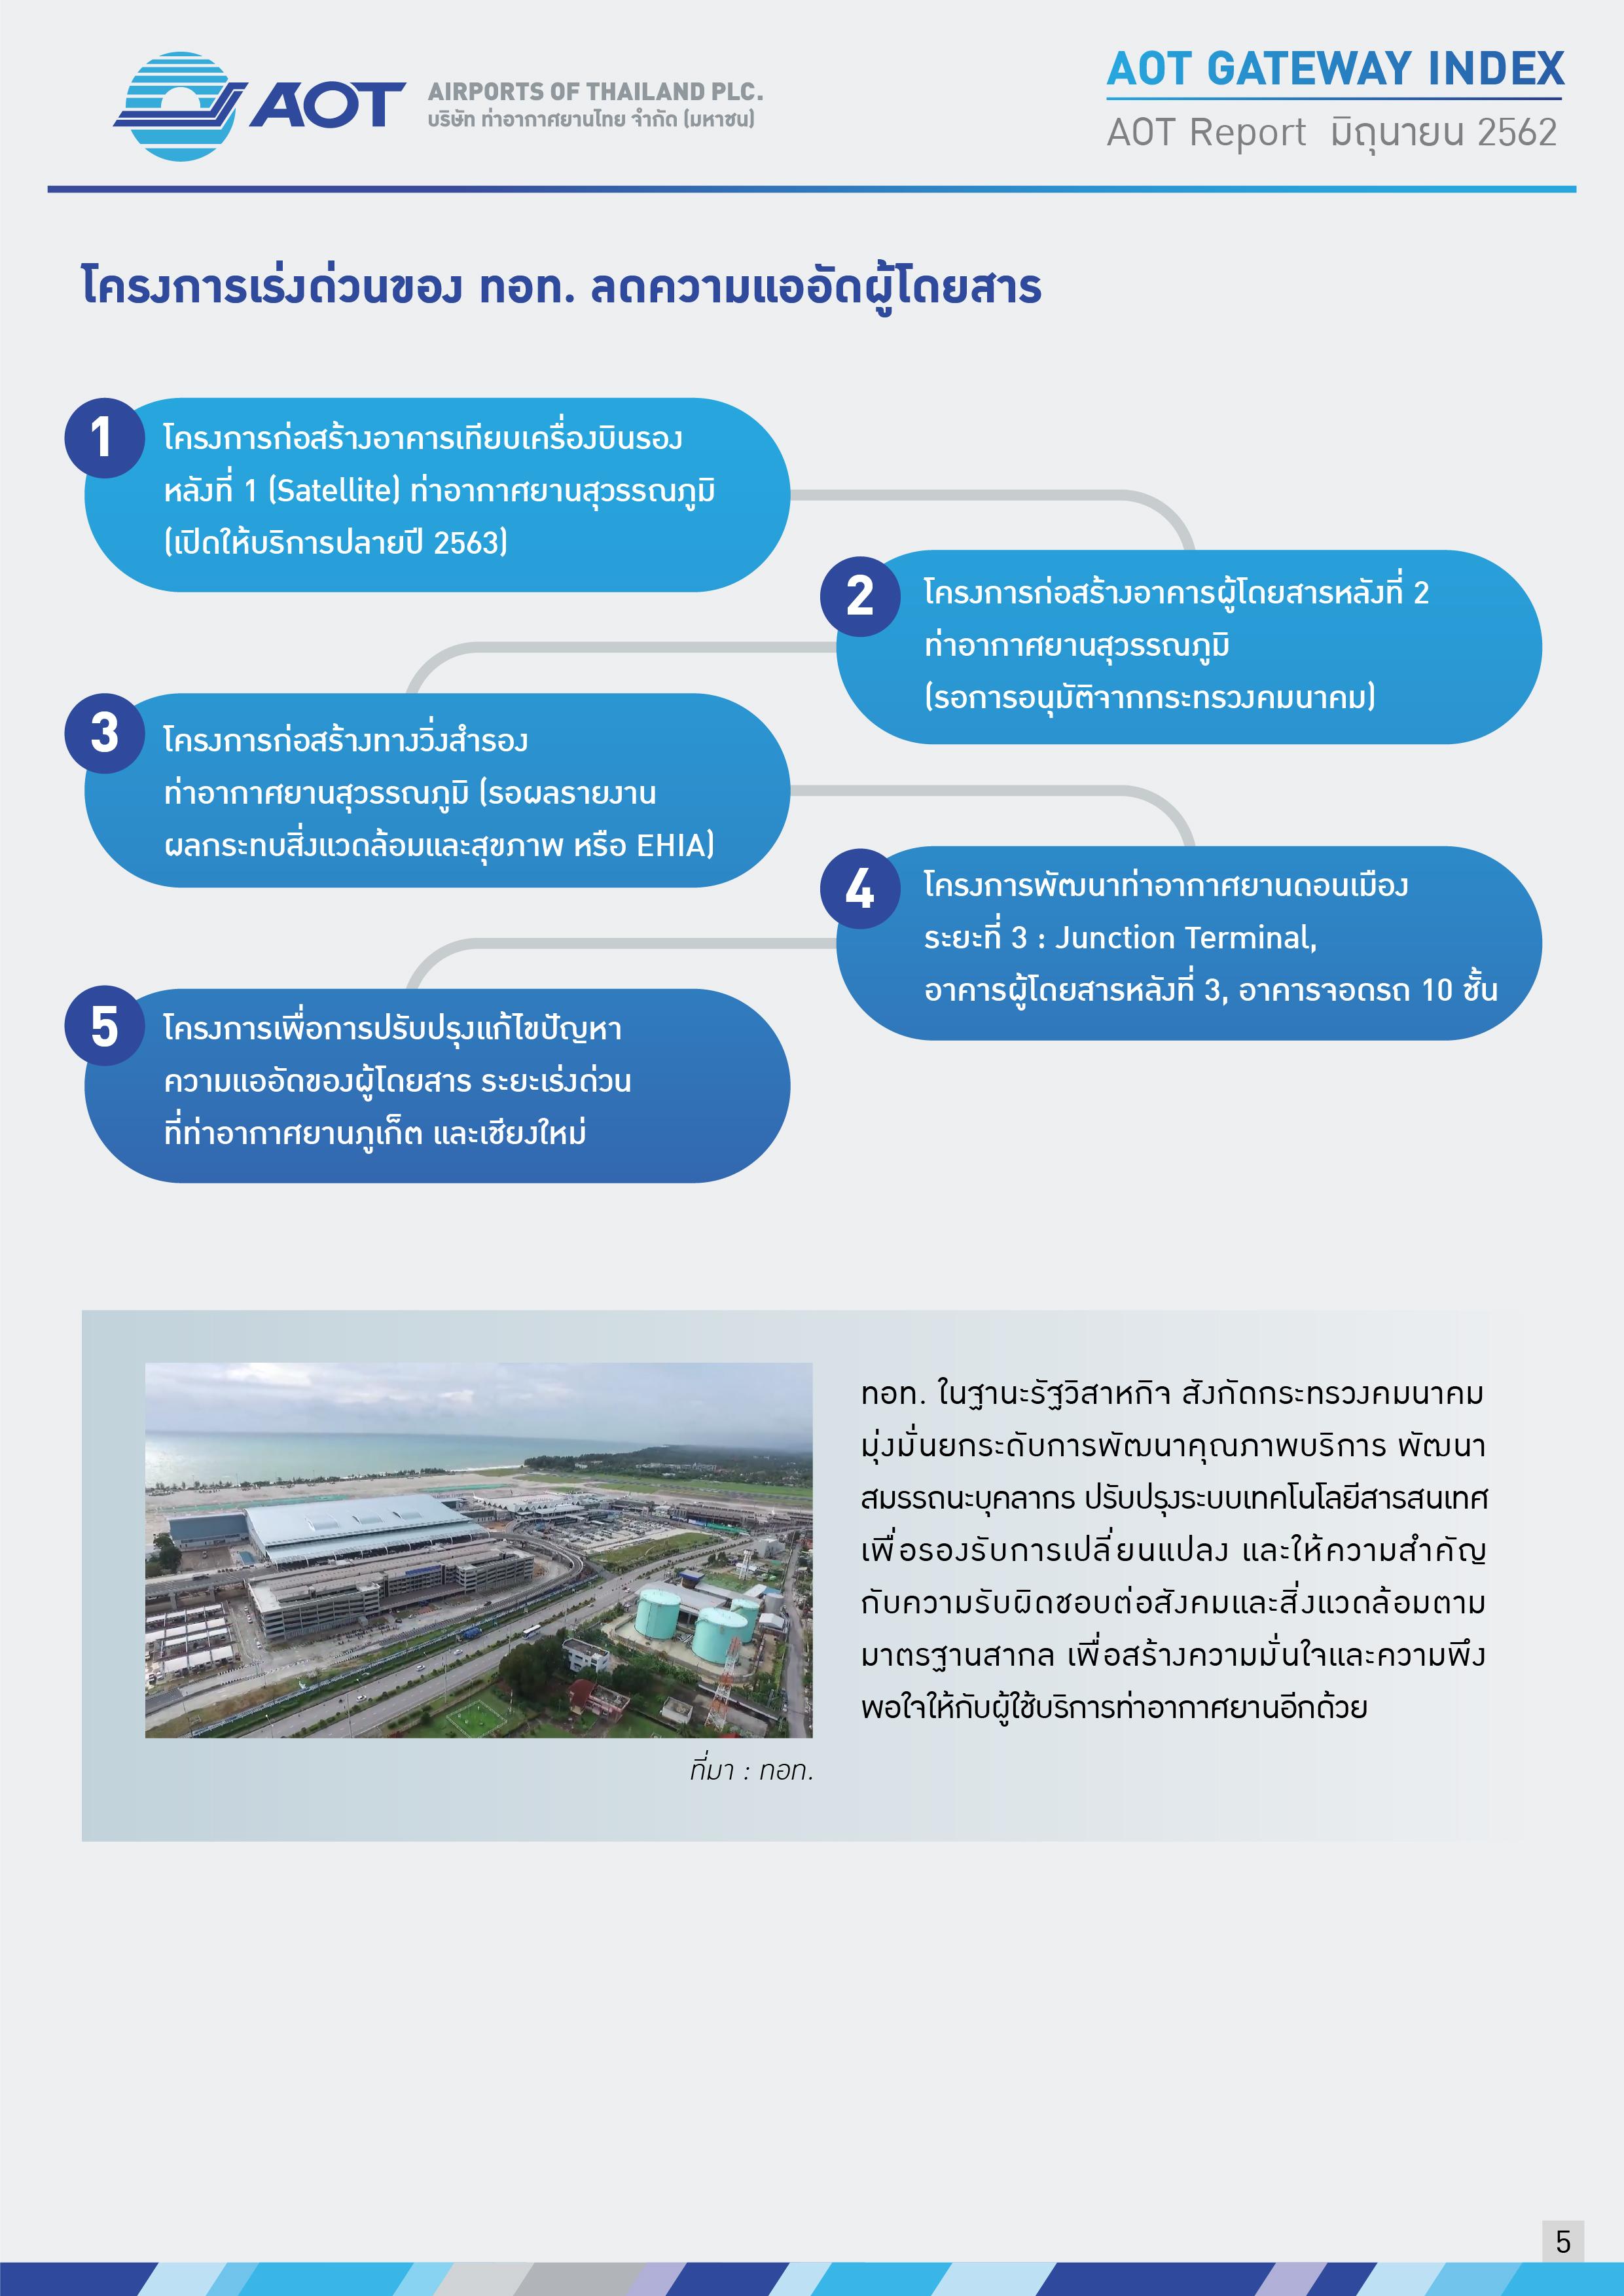 AOTcontent2019_Index7_AOT นิวไฮต่อเนื่อง 4 ปีซ้อน _ มุ่งสู่ปีที่ 5 โอกาสและความท้าทาย_V3_20190828_Page05